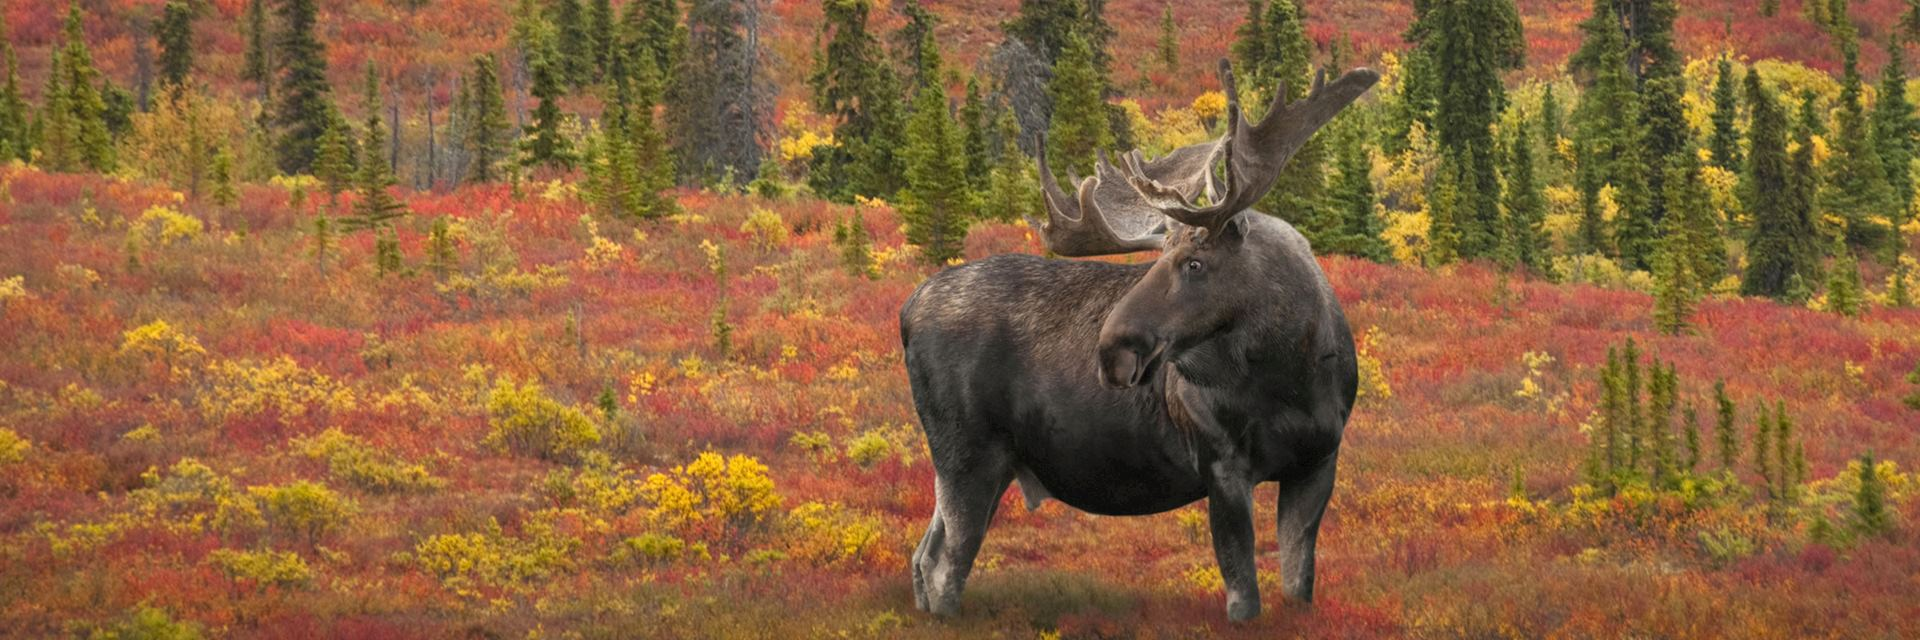 Alaska bull moose, Denali National Park